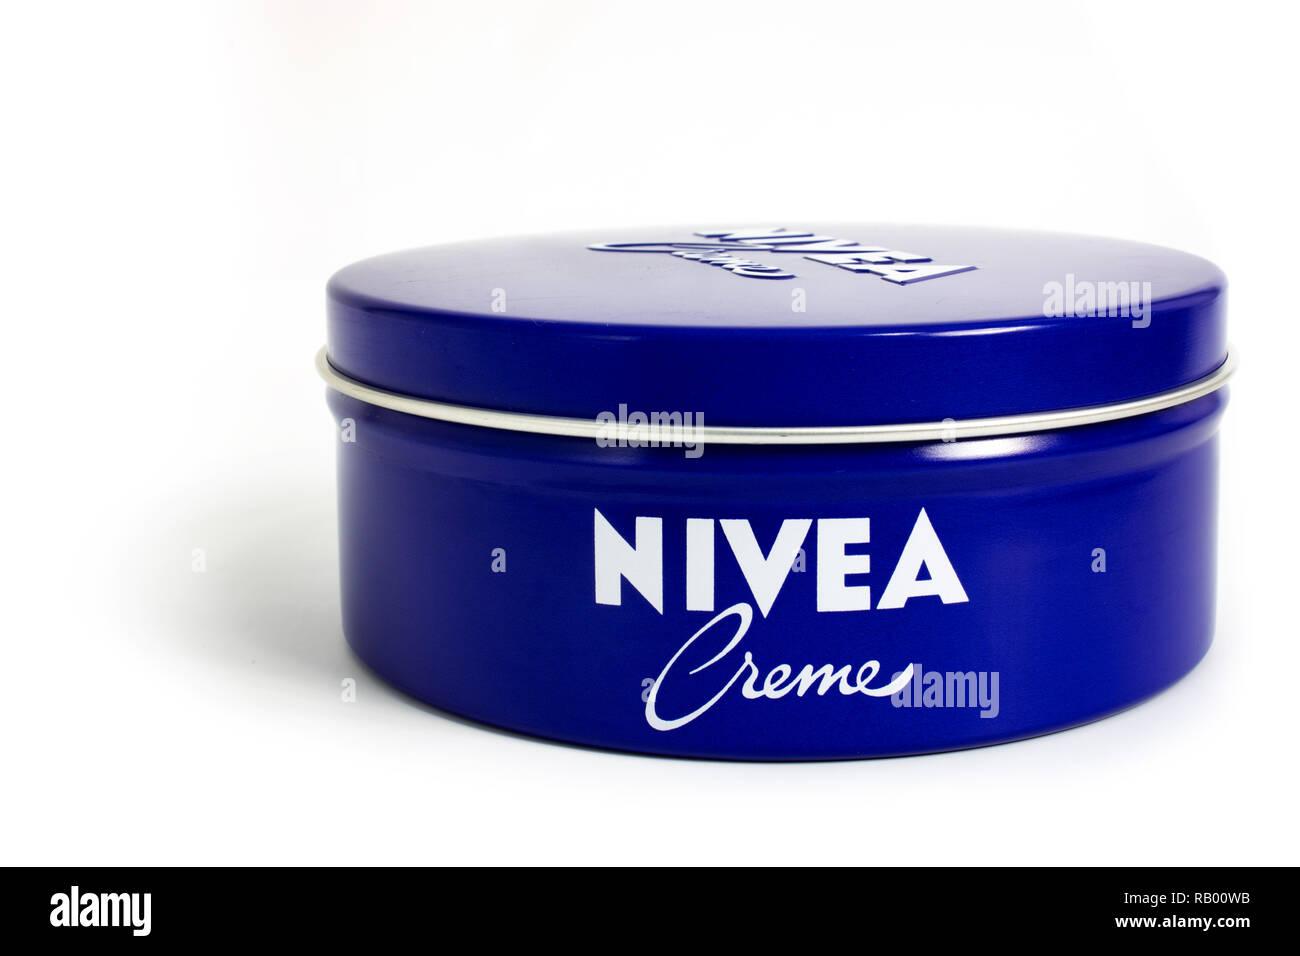 Prague, CZECH REPUBLIC - DECEMBER 30, 2018: Nivea Creme, the world's famous skin cream skin cream in a metal jar laid on white background - Stock Image